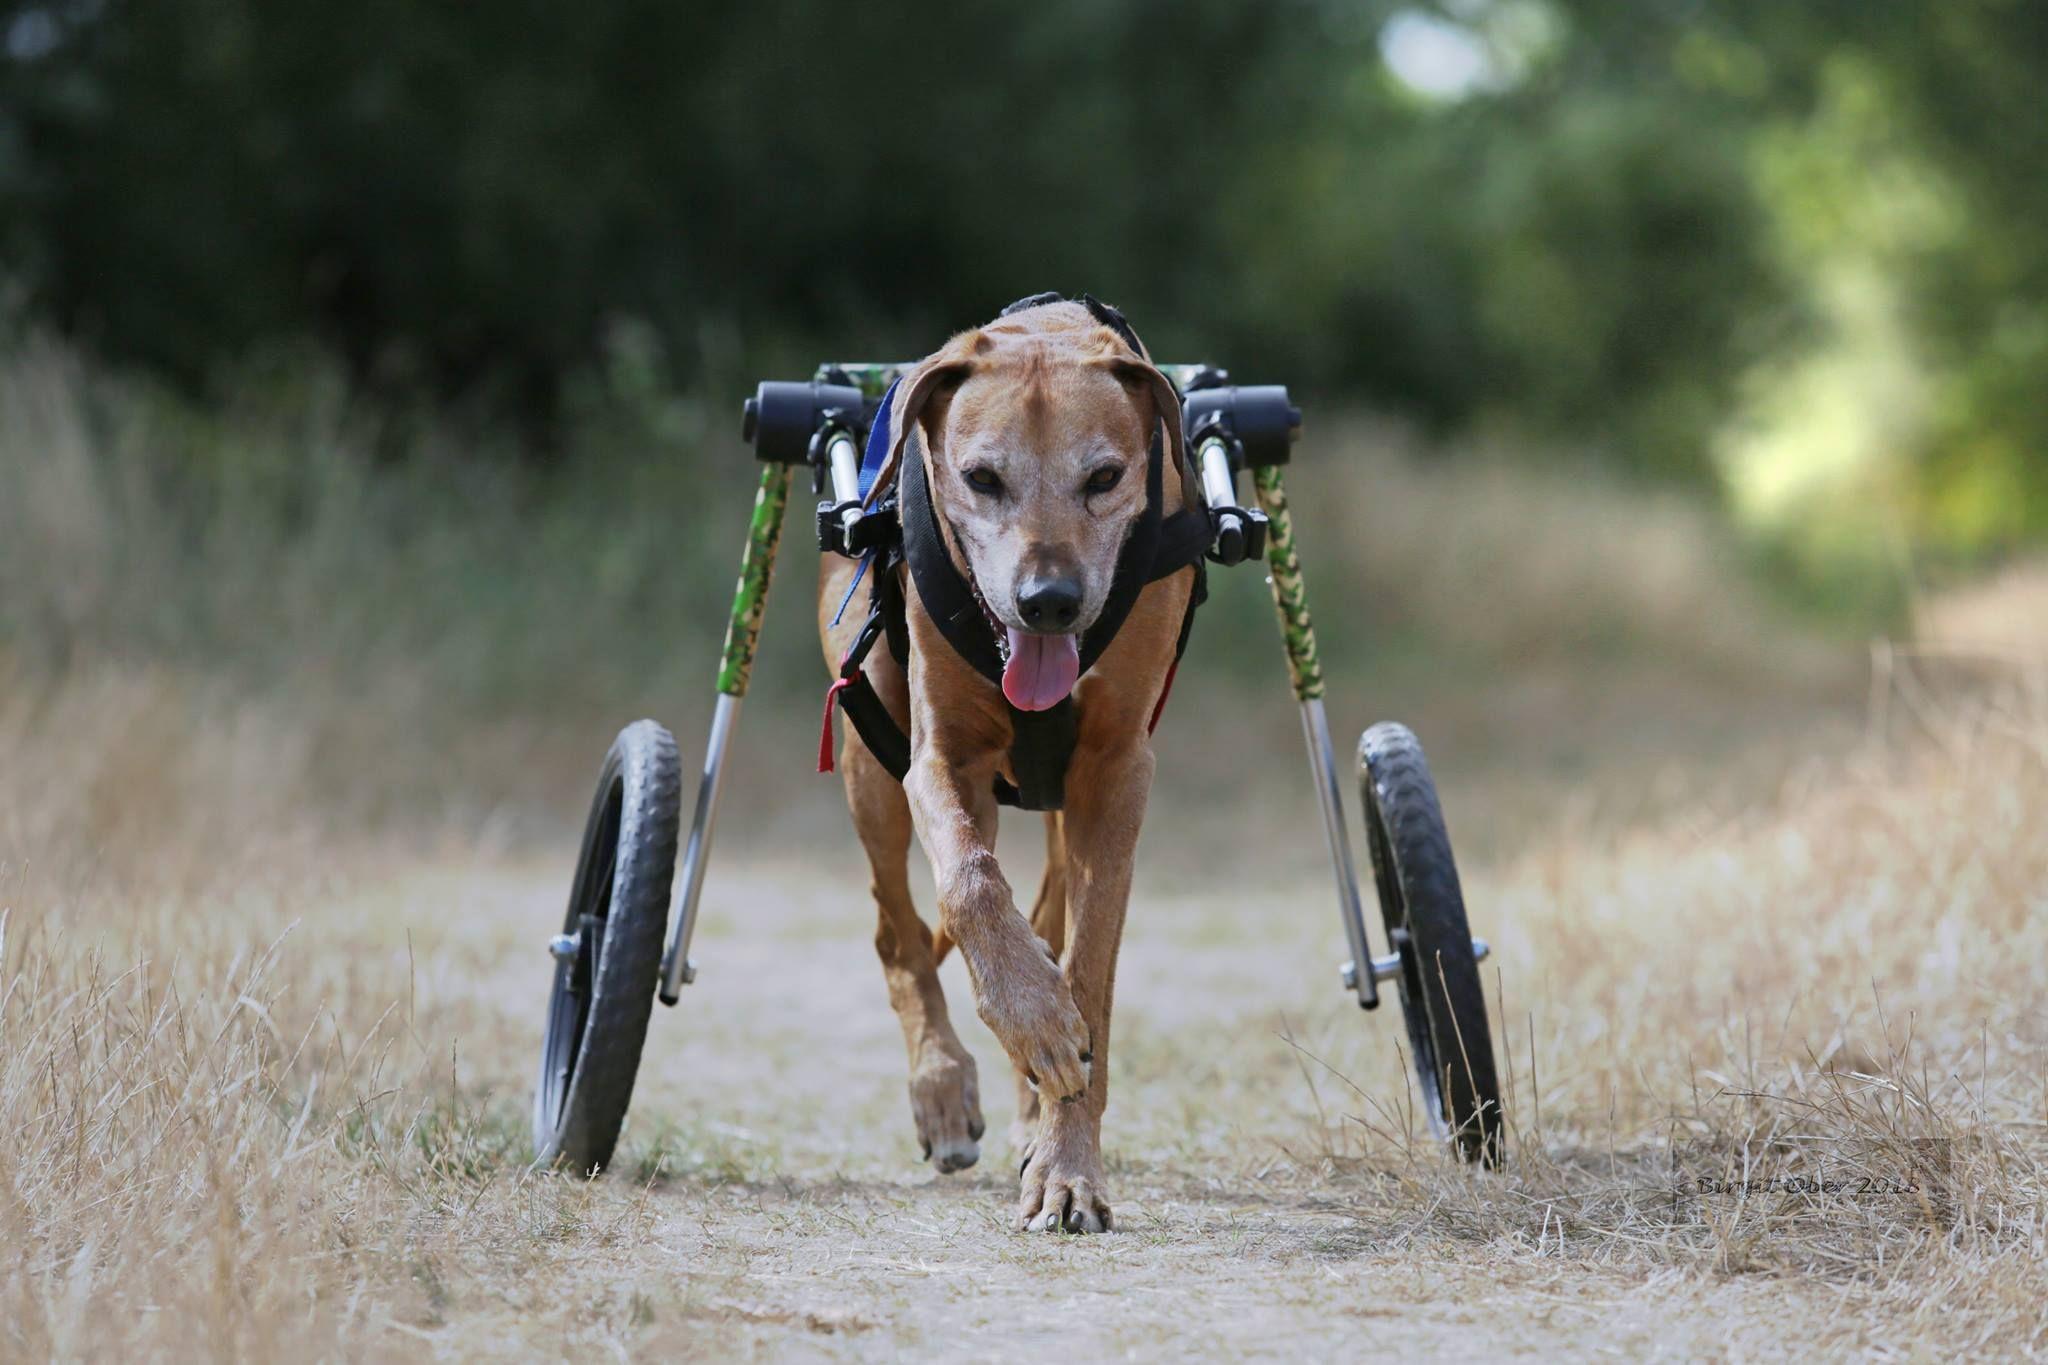 Walkin' Wheels Large Dog Wheelchair for Dog wheelchair